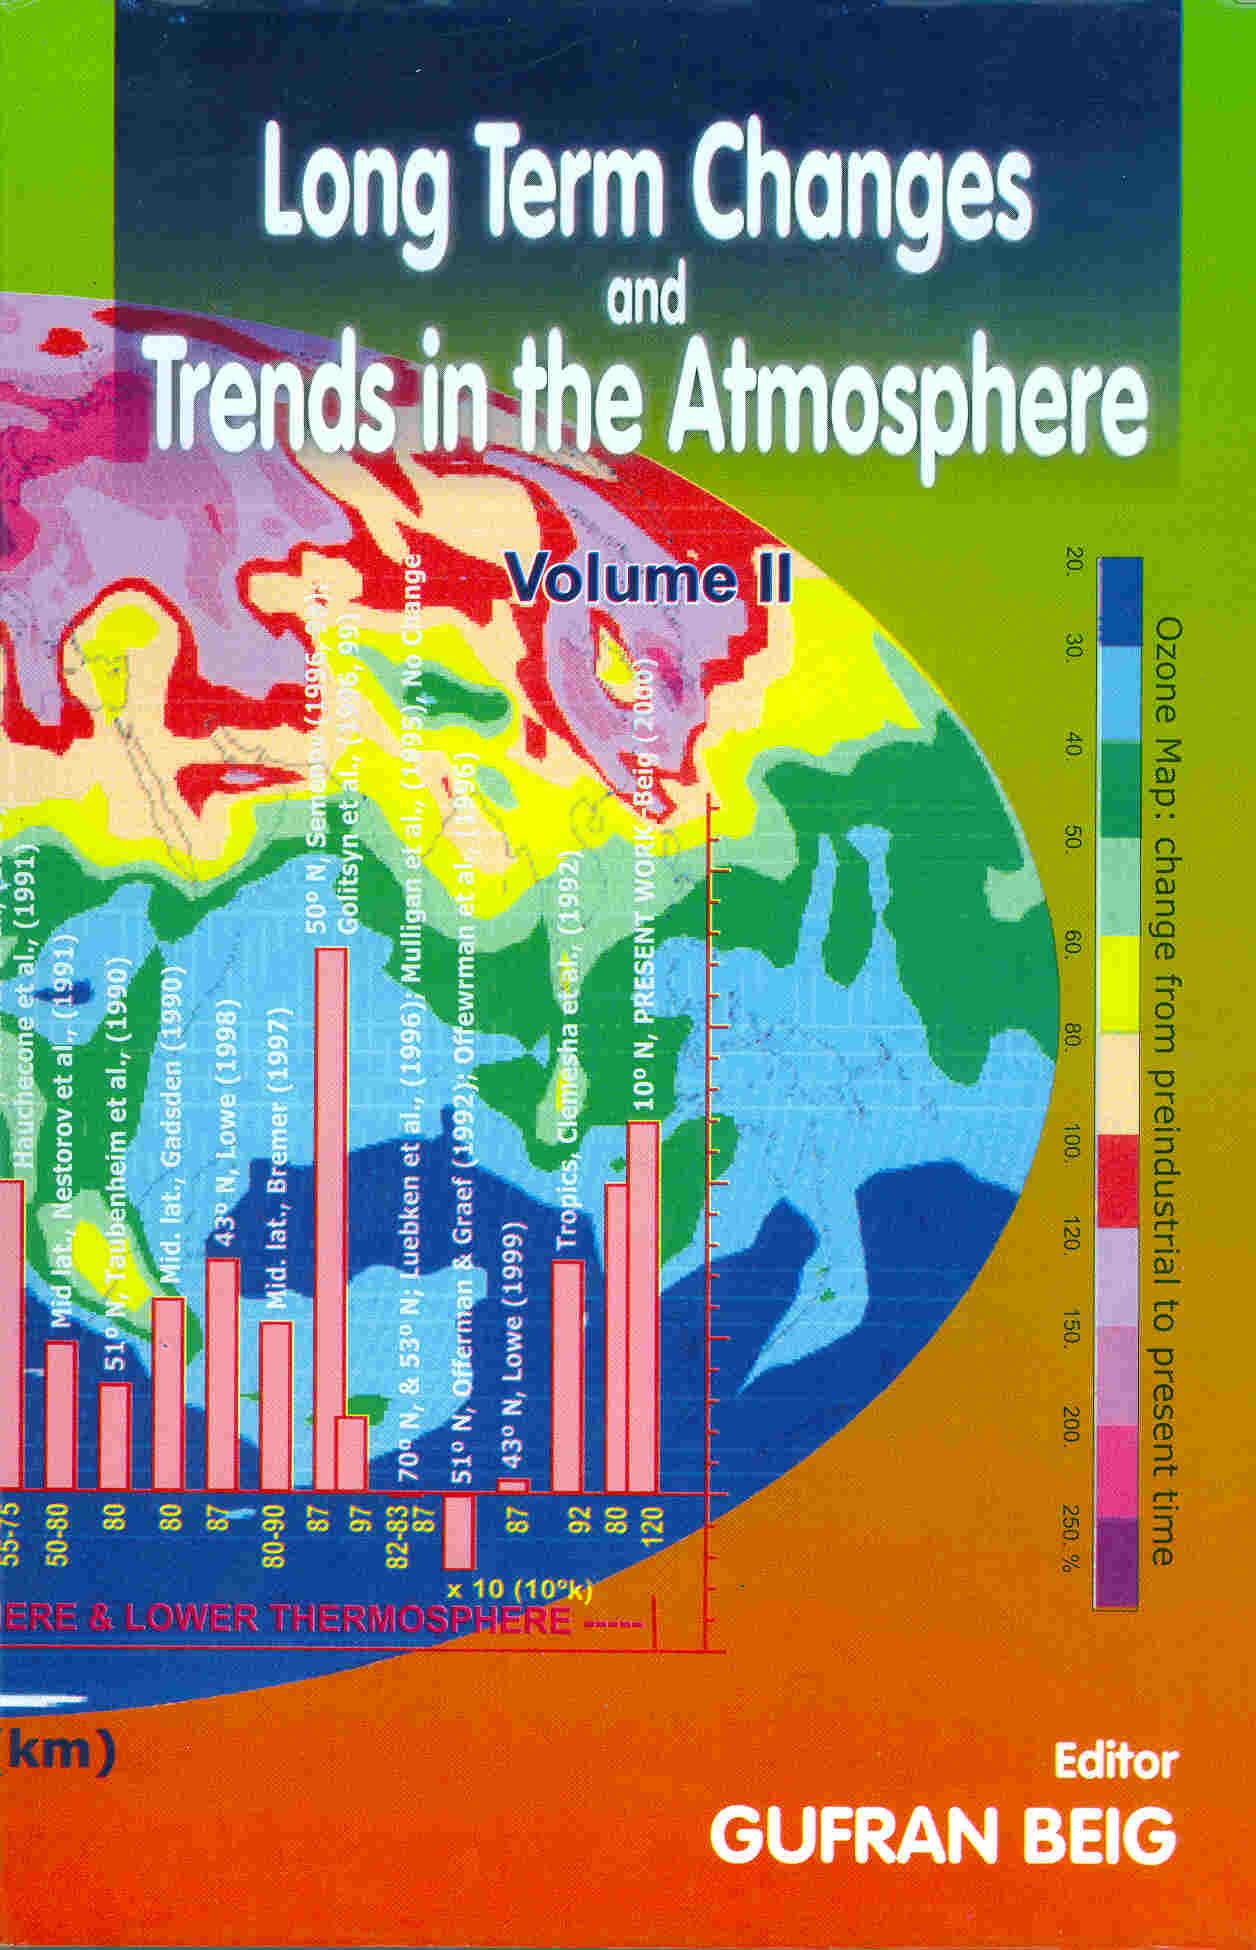 Meteorology (4th Ed.) William Donn Textbook